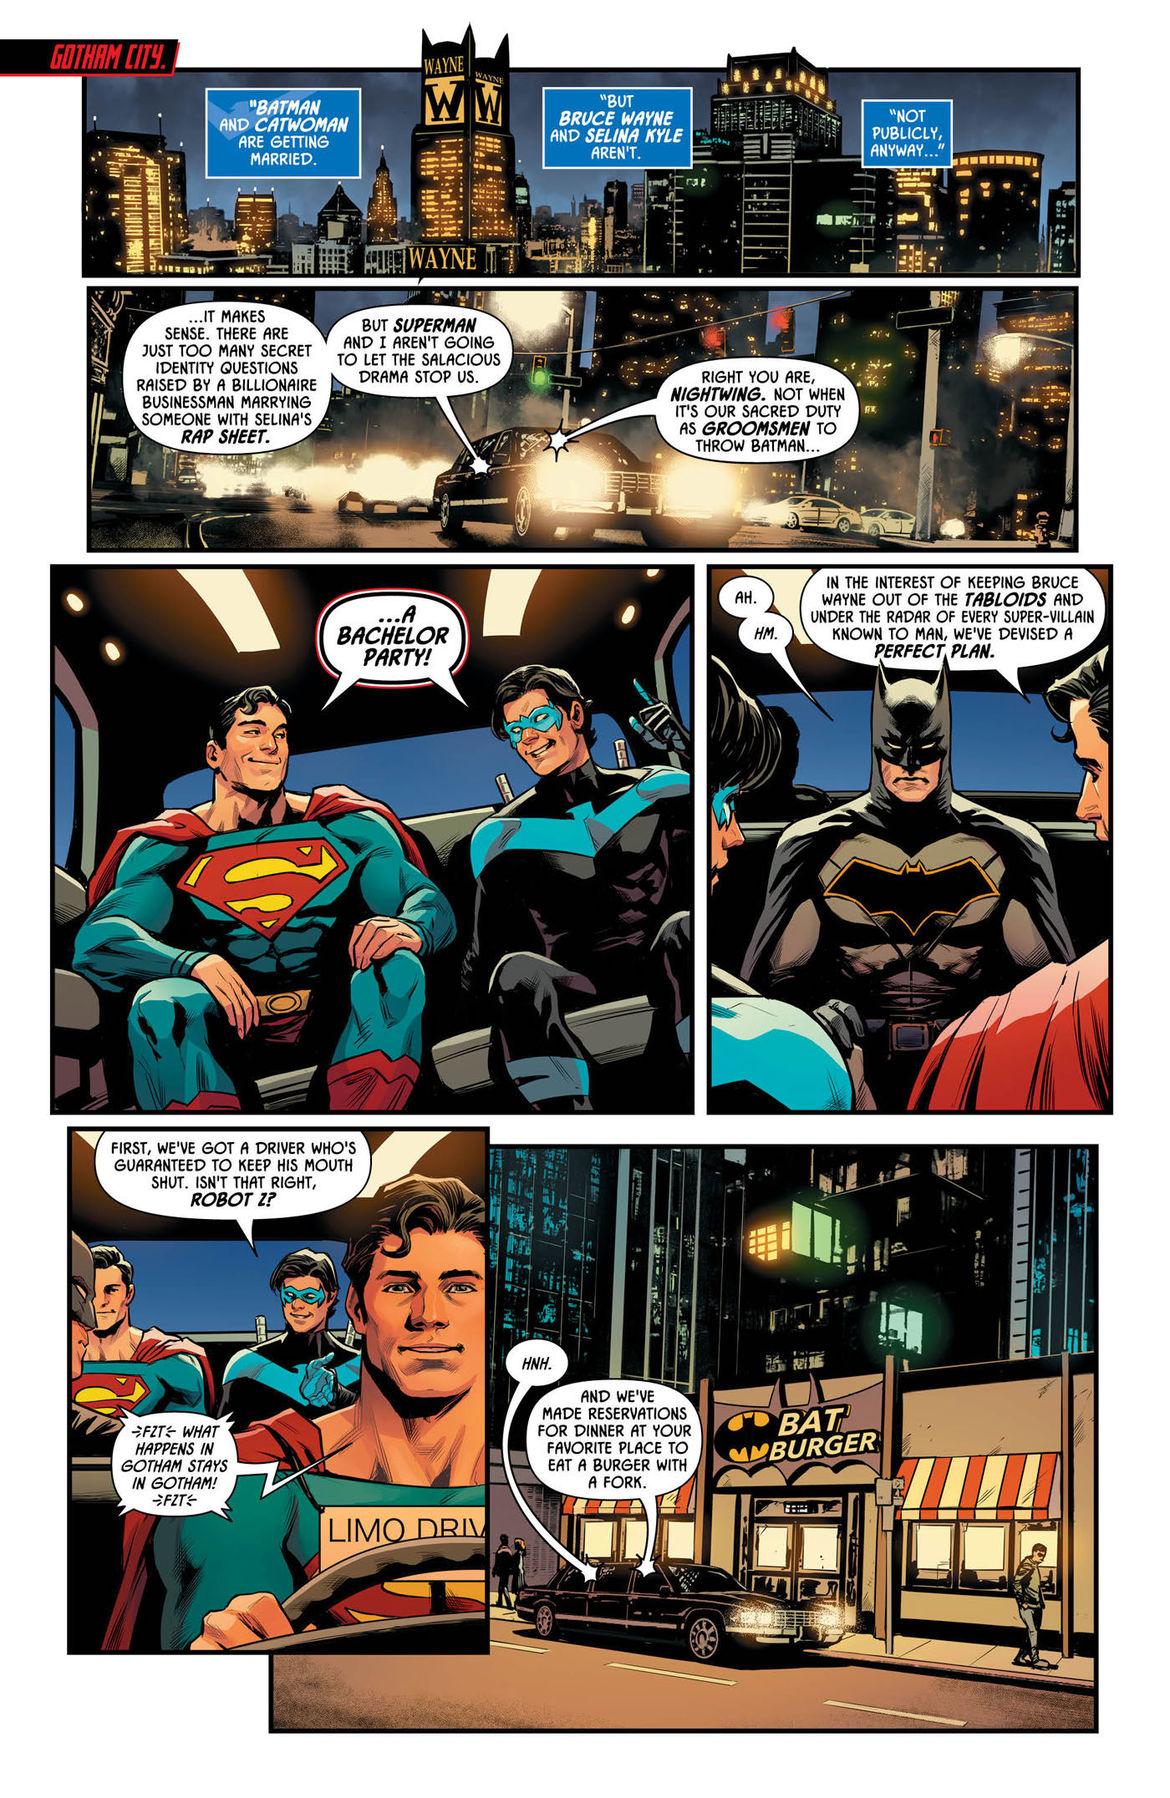 Batman Prelude to the Wedding Nightwing vs Hush 1 page 1